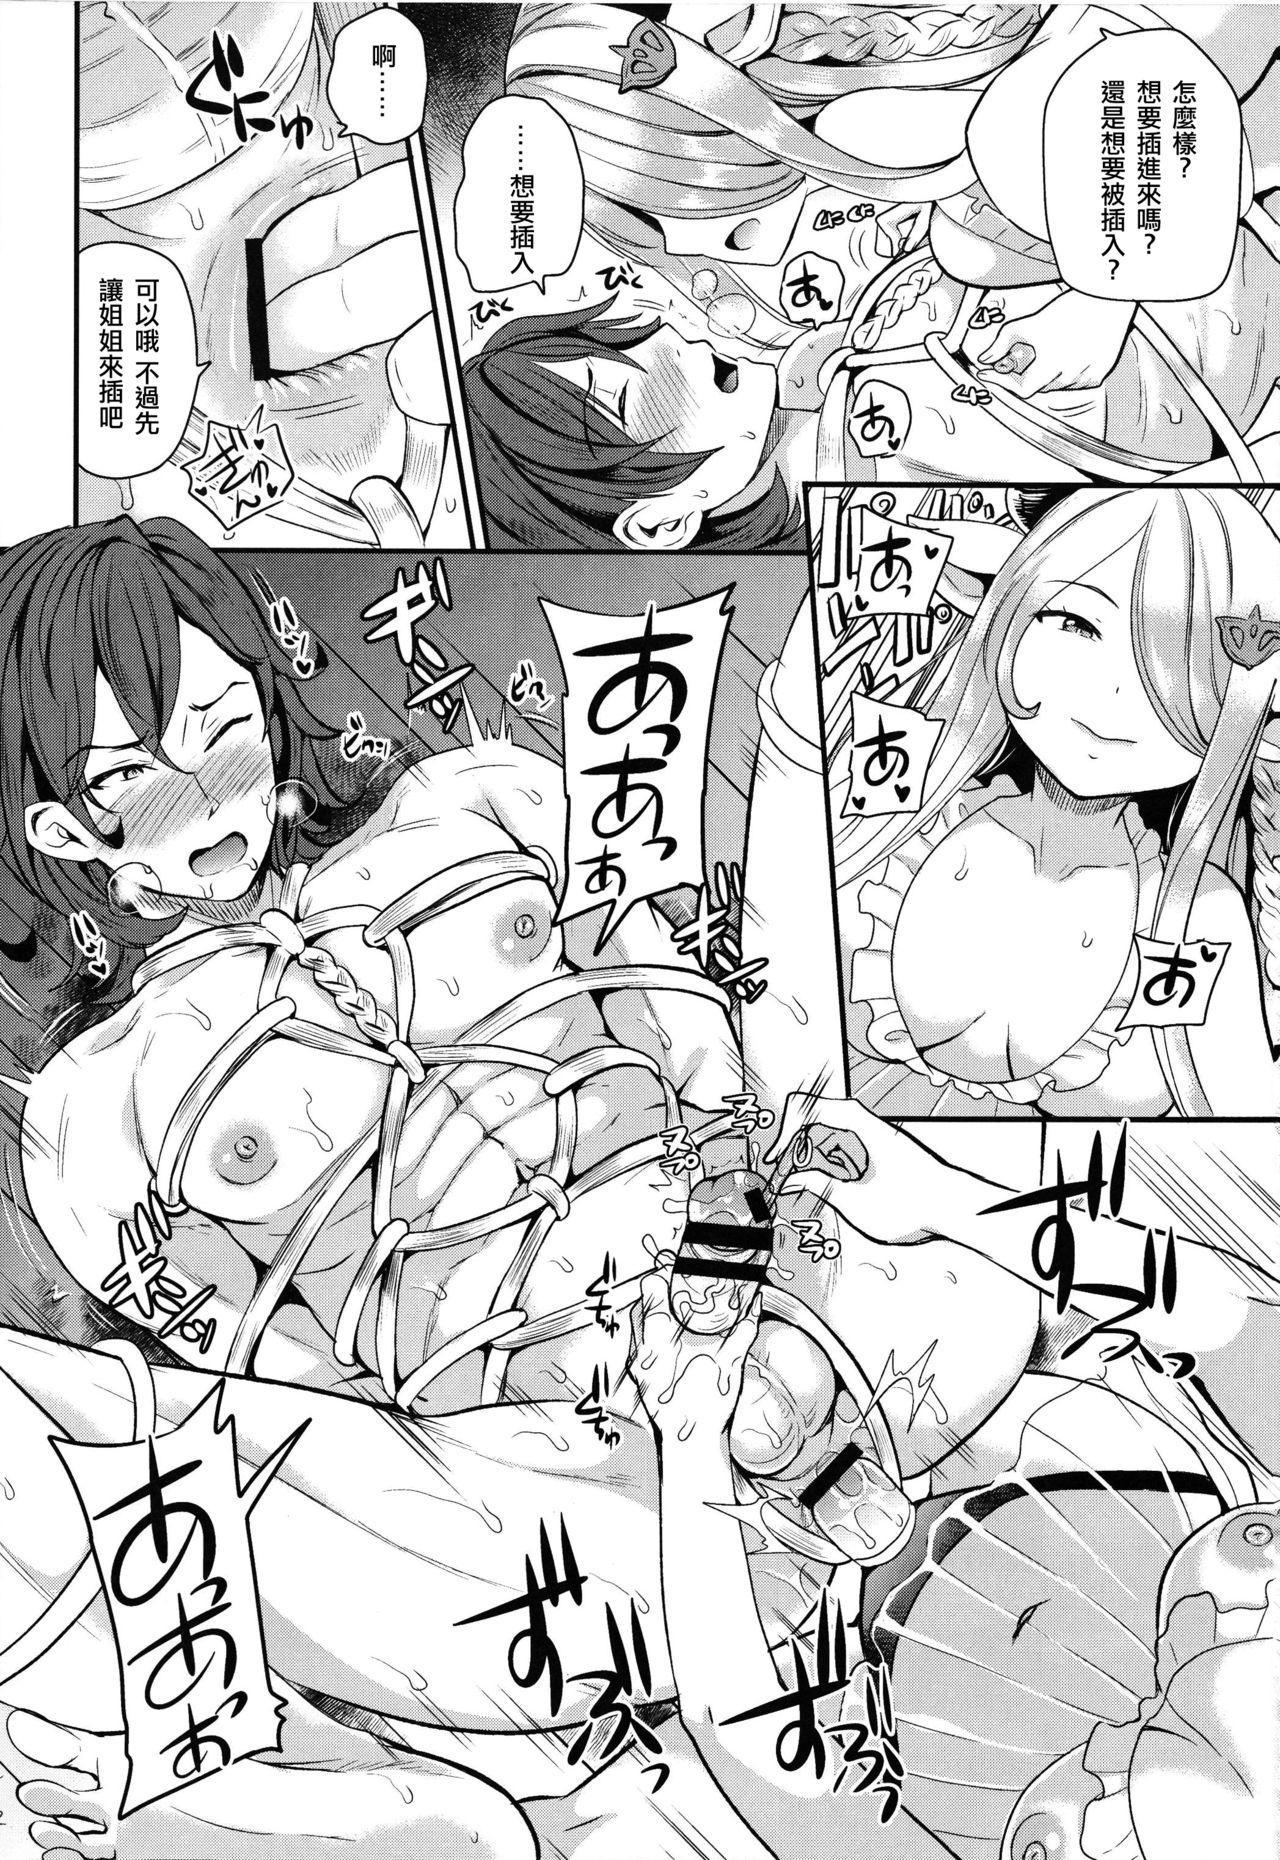 (C91) [Momoiro-Rip (Sugar Milk)] Onee-san to Per-chan (Granblue Fantasy) [Chinese] [沒有漢化] 12